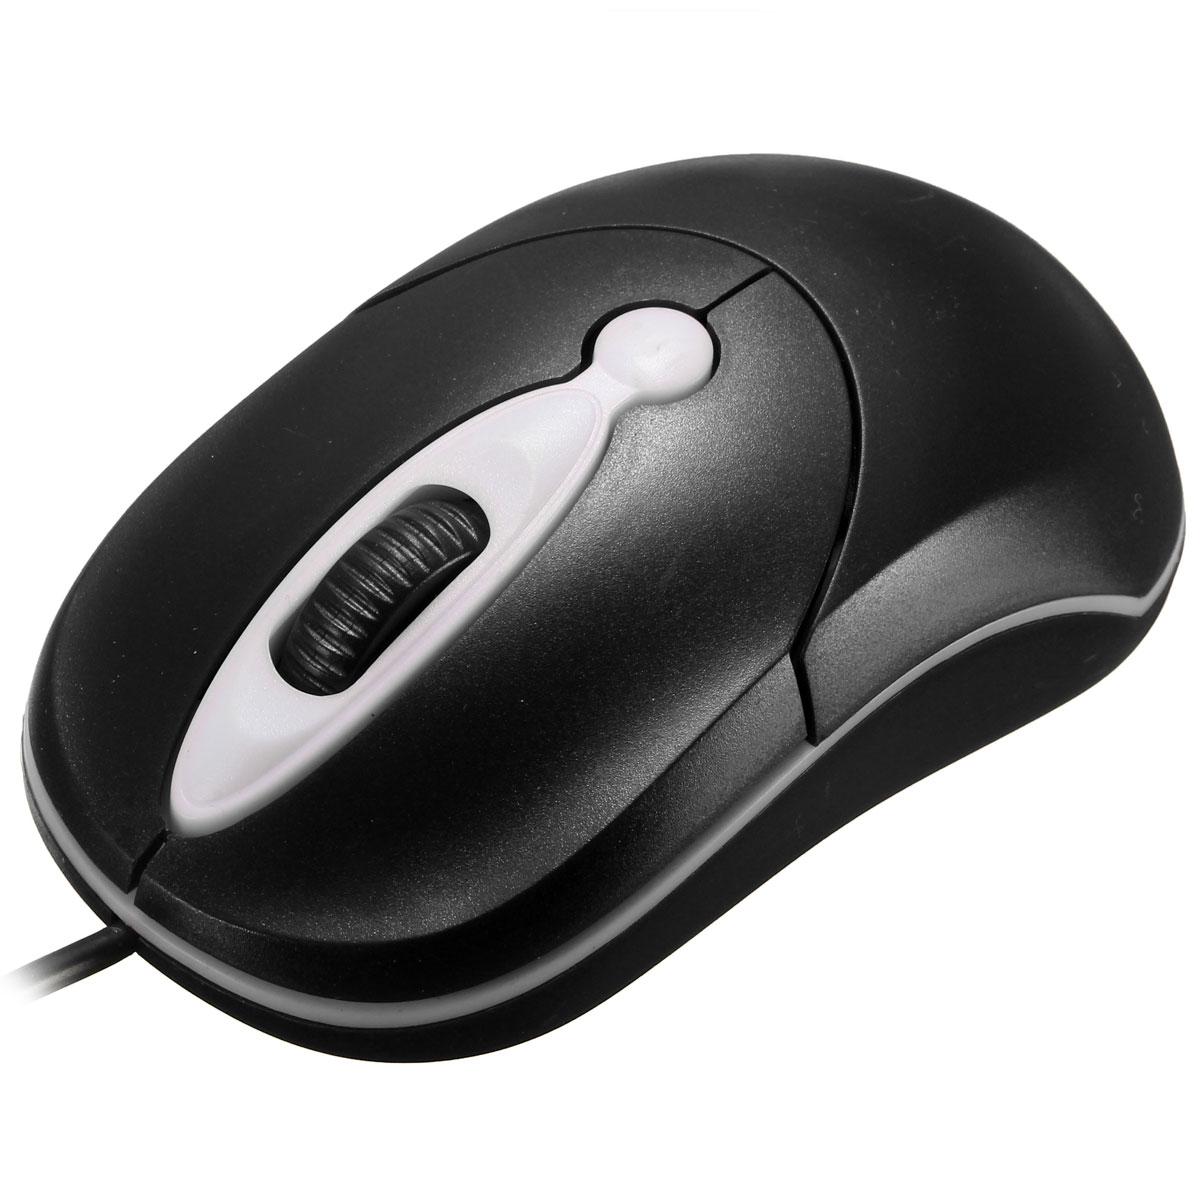 All About Amazoncom Amazonbasics 3button Usb Wired Mouse Black Electronics